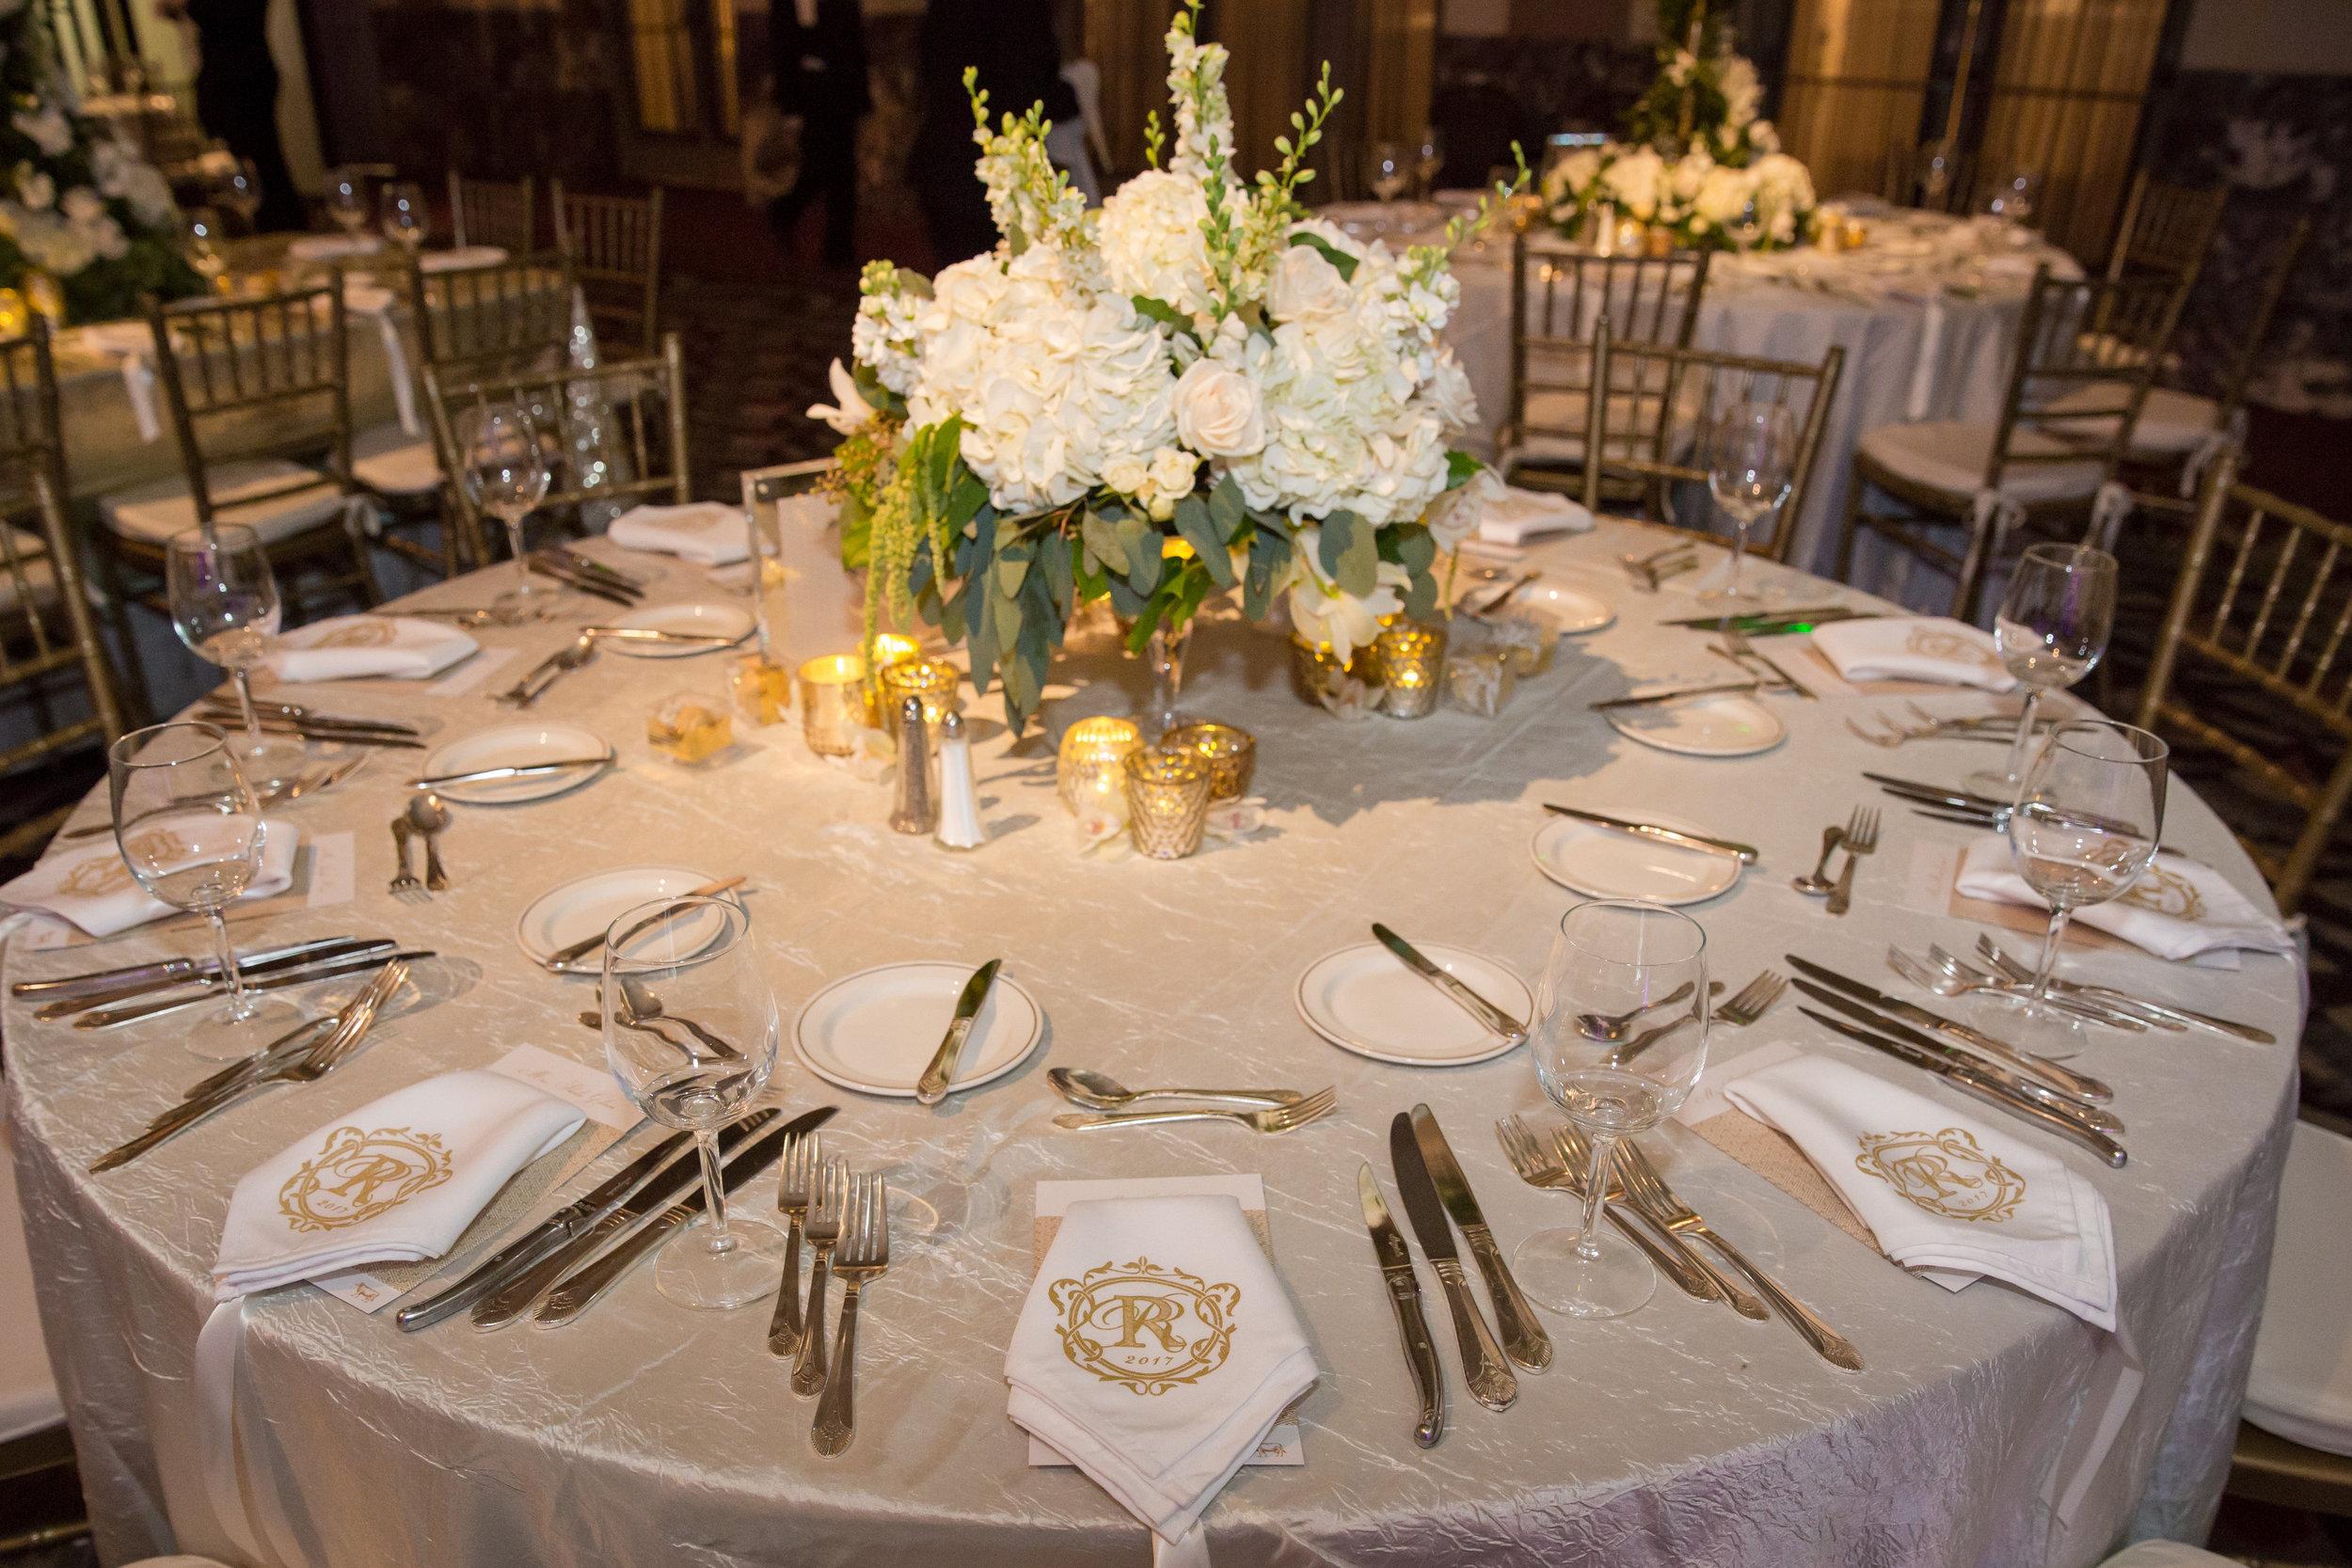 event-design-custom-silkscreen-napkins-menus-reception-elegant.jpg